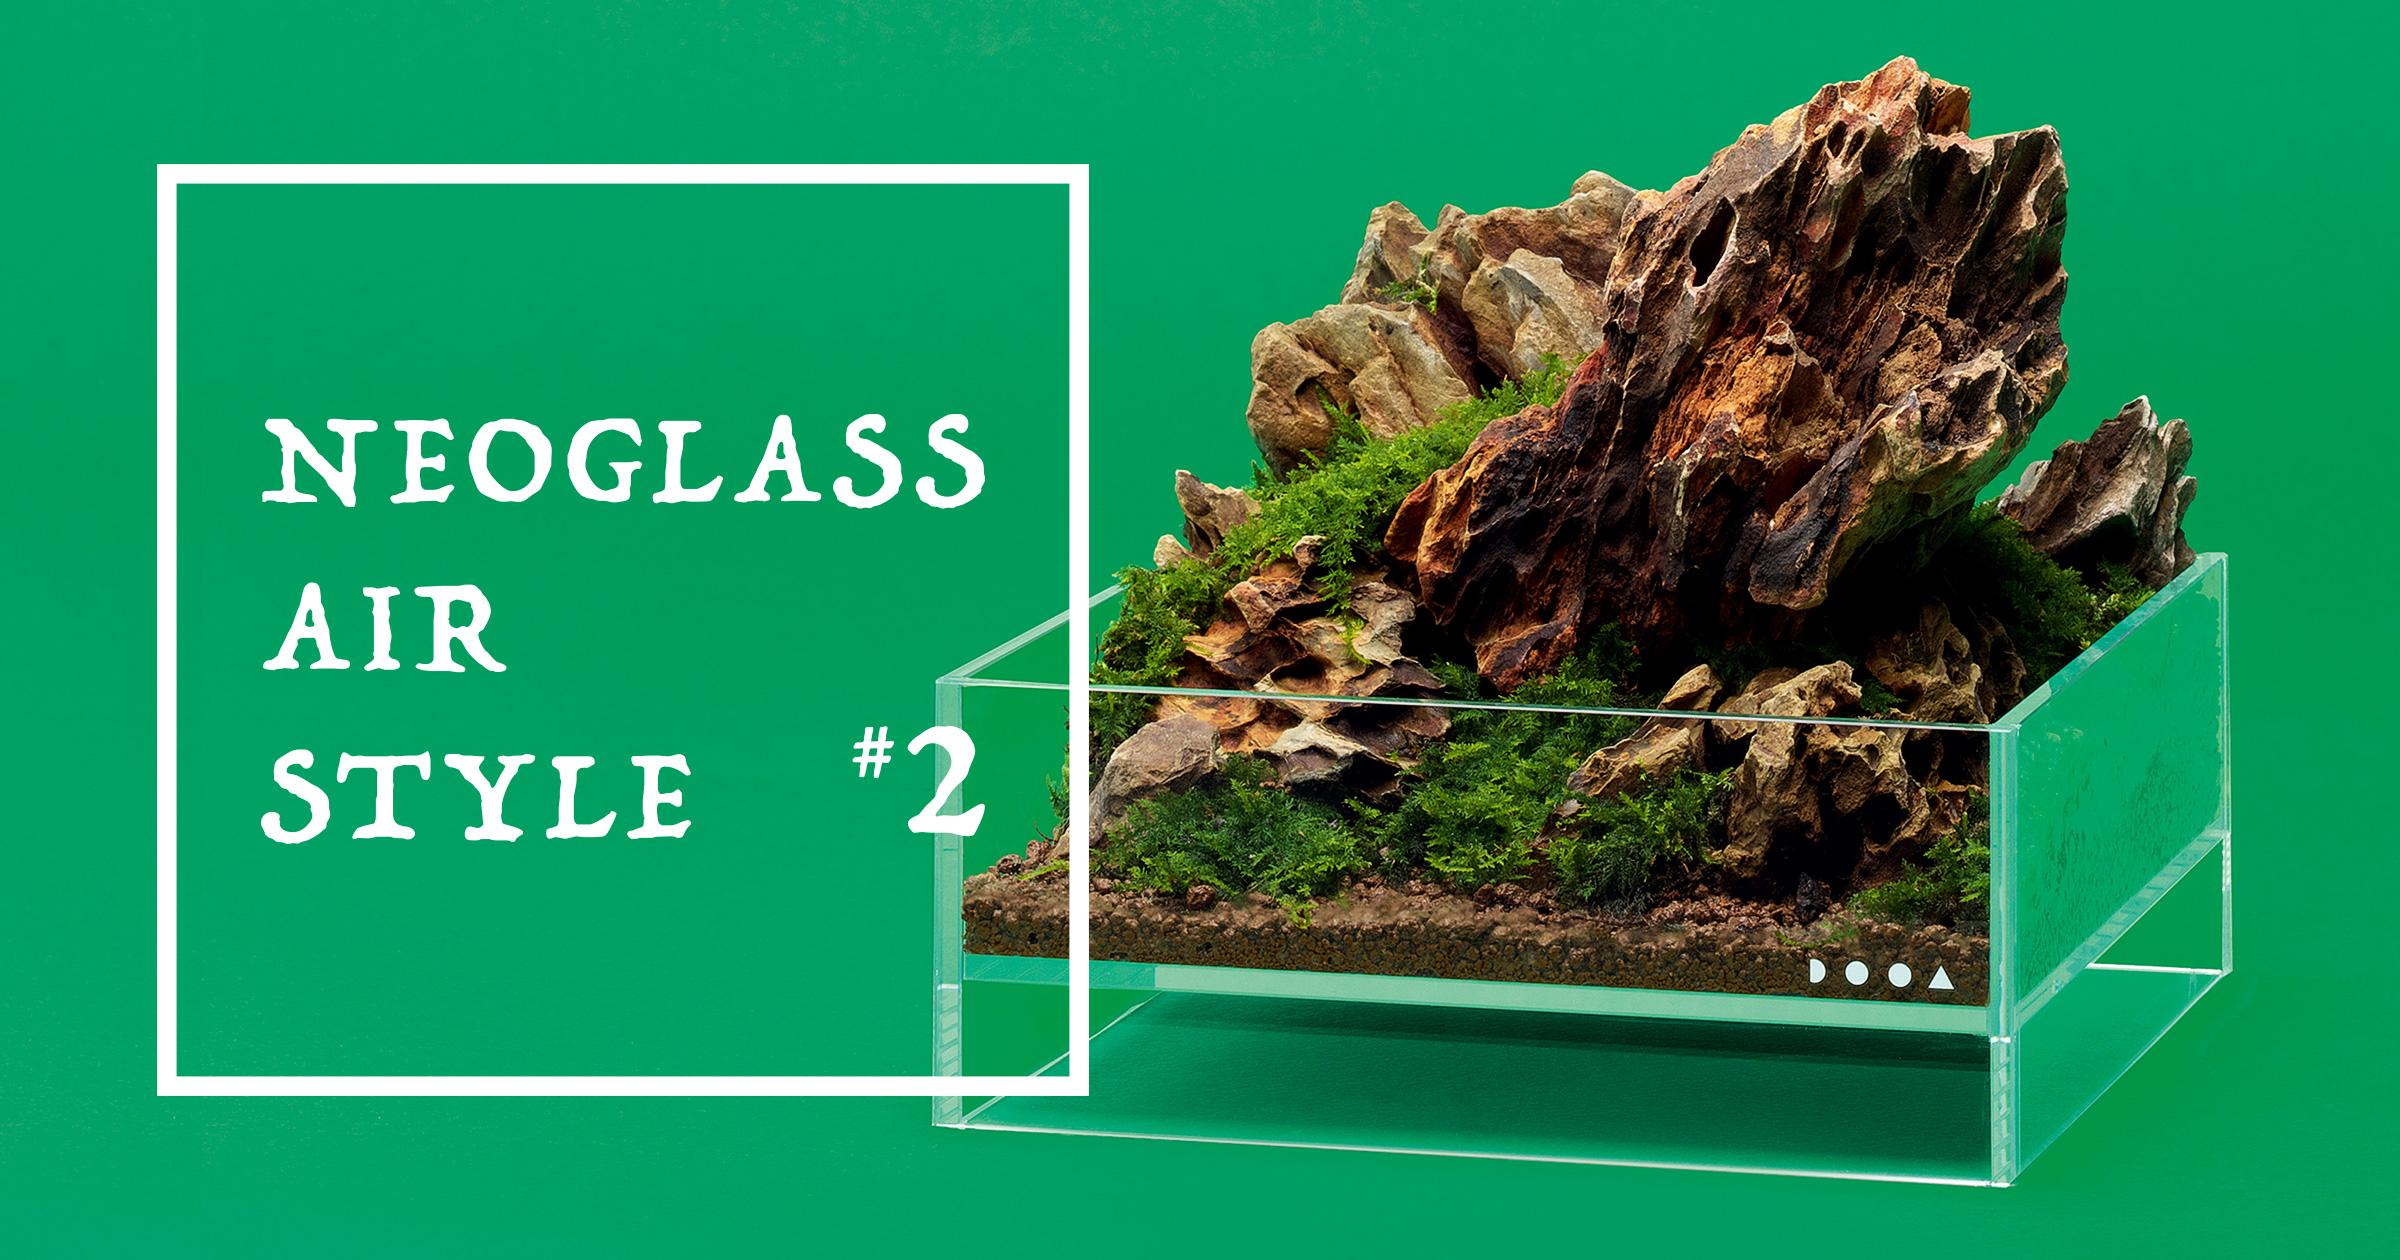 NEOGLASS AIR STYLE #2